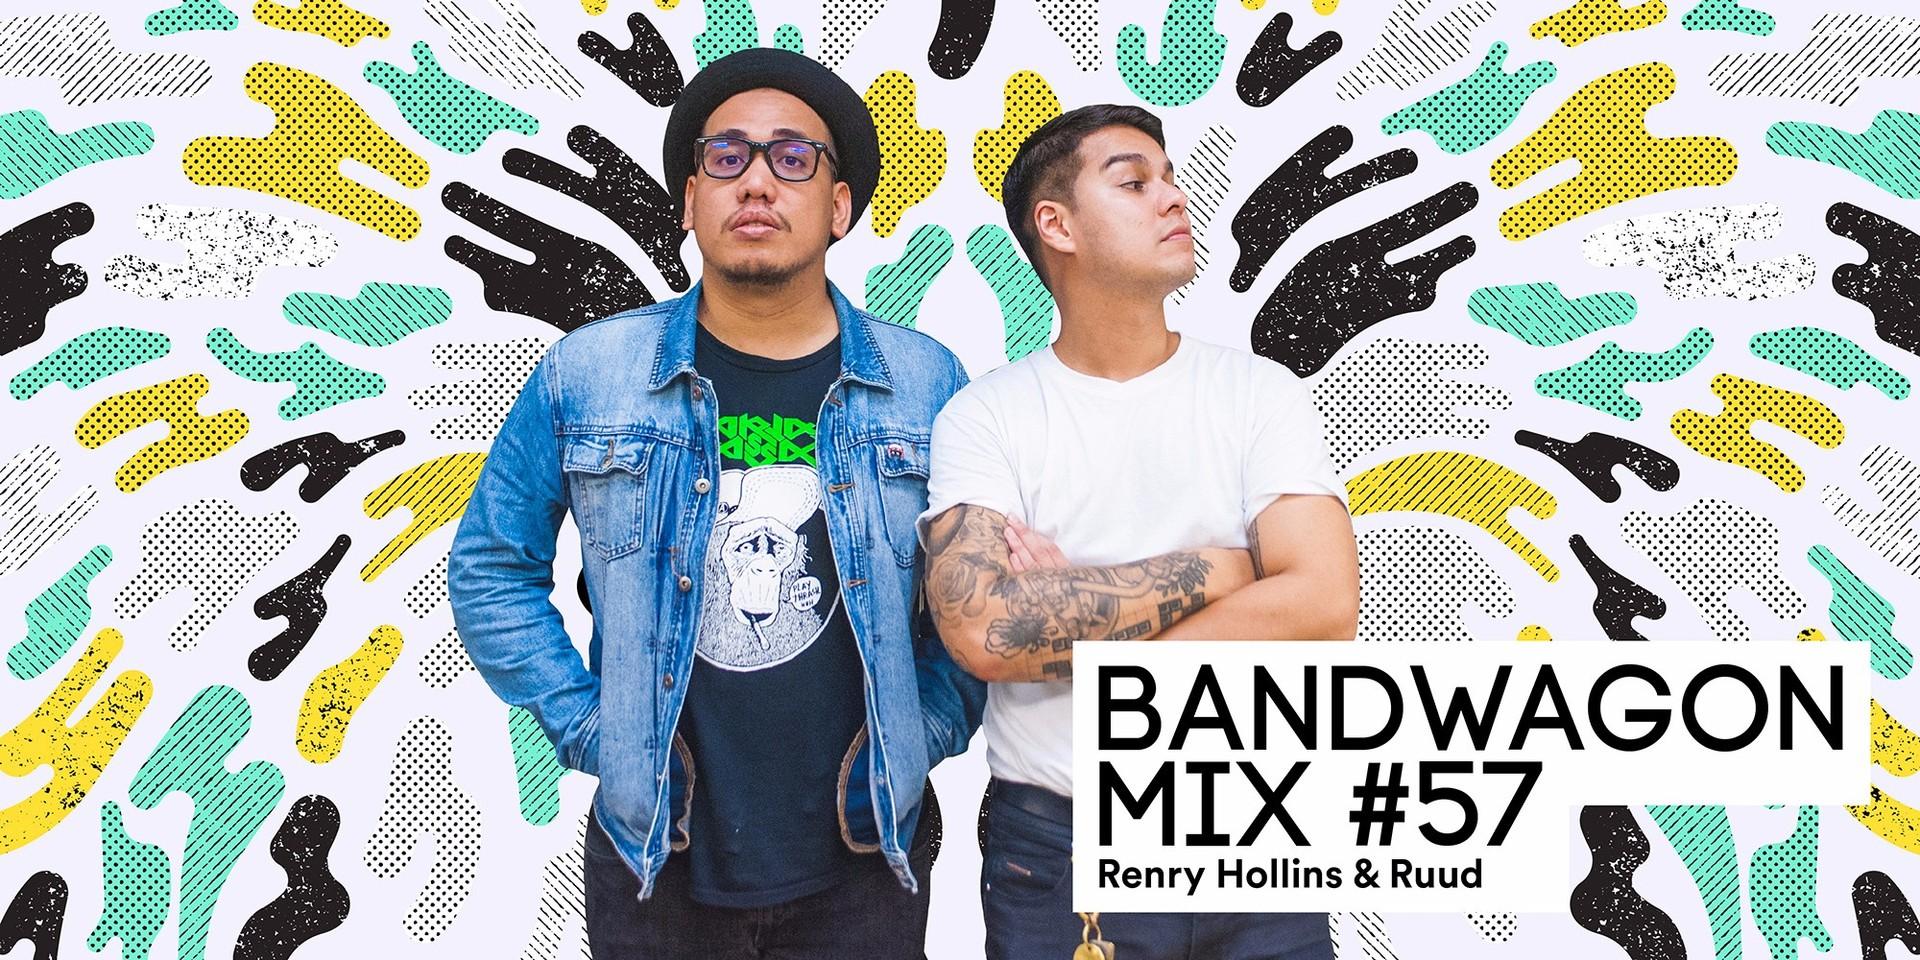 Bandwagon Mix #57: Renry Hollins & Ruud